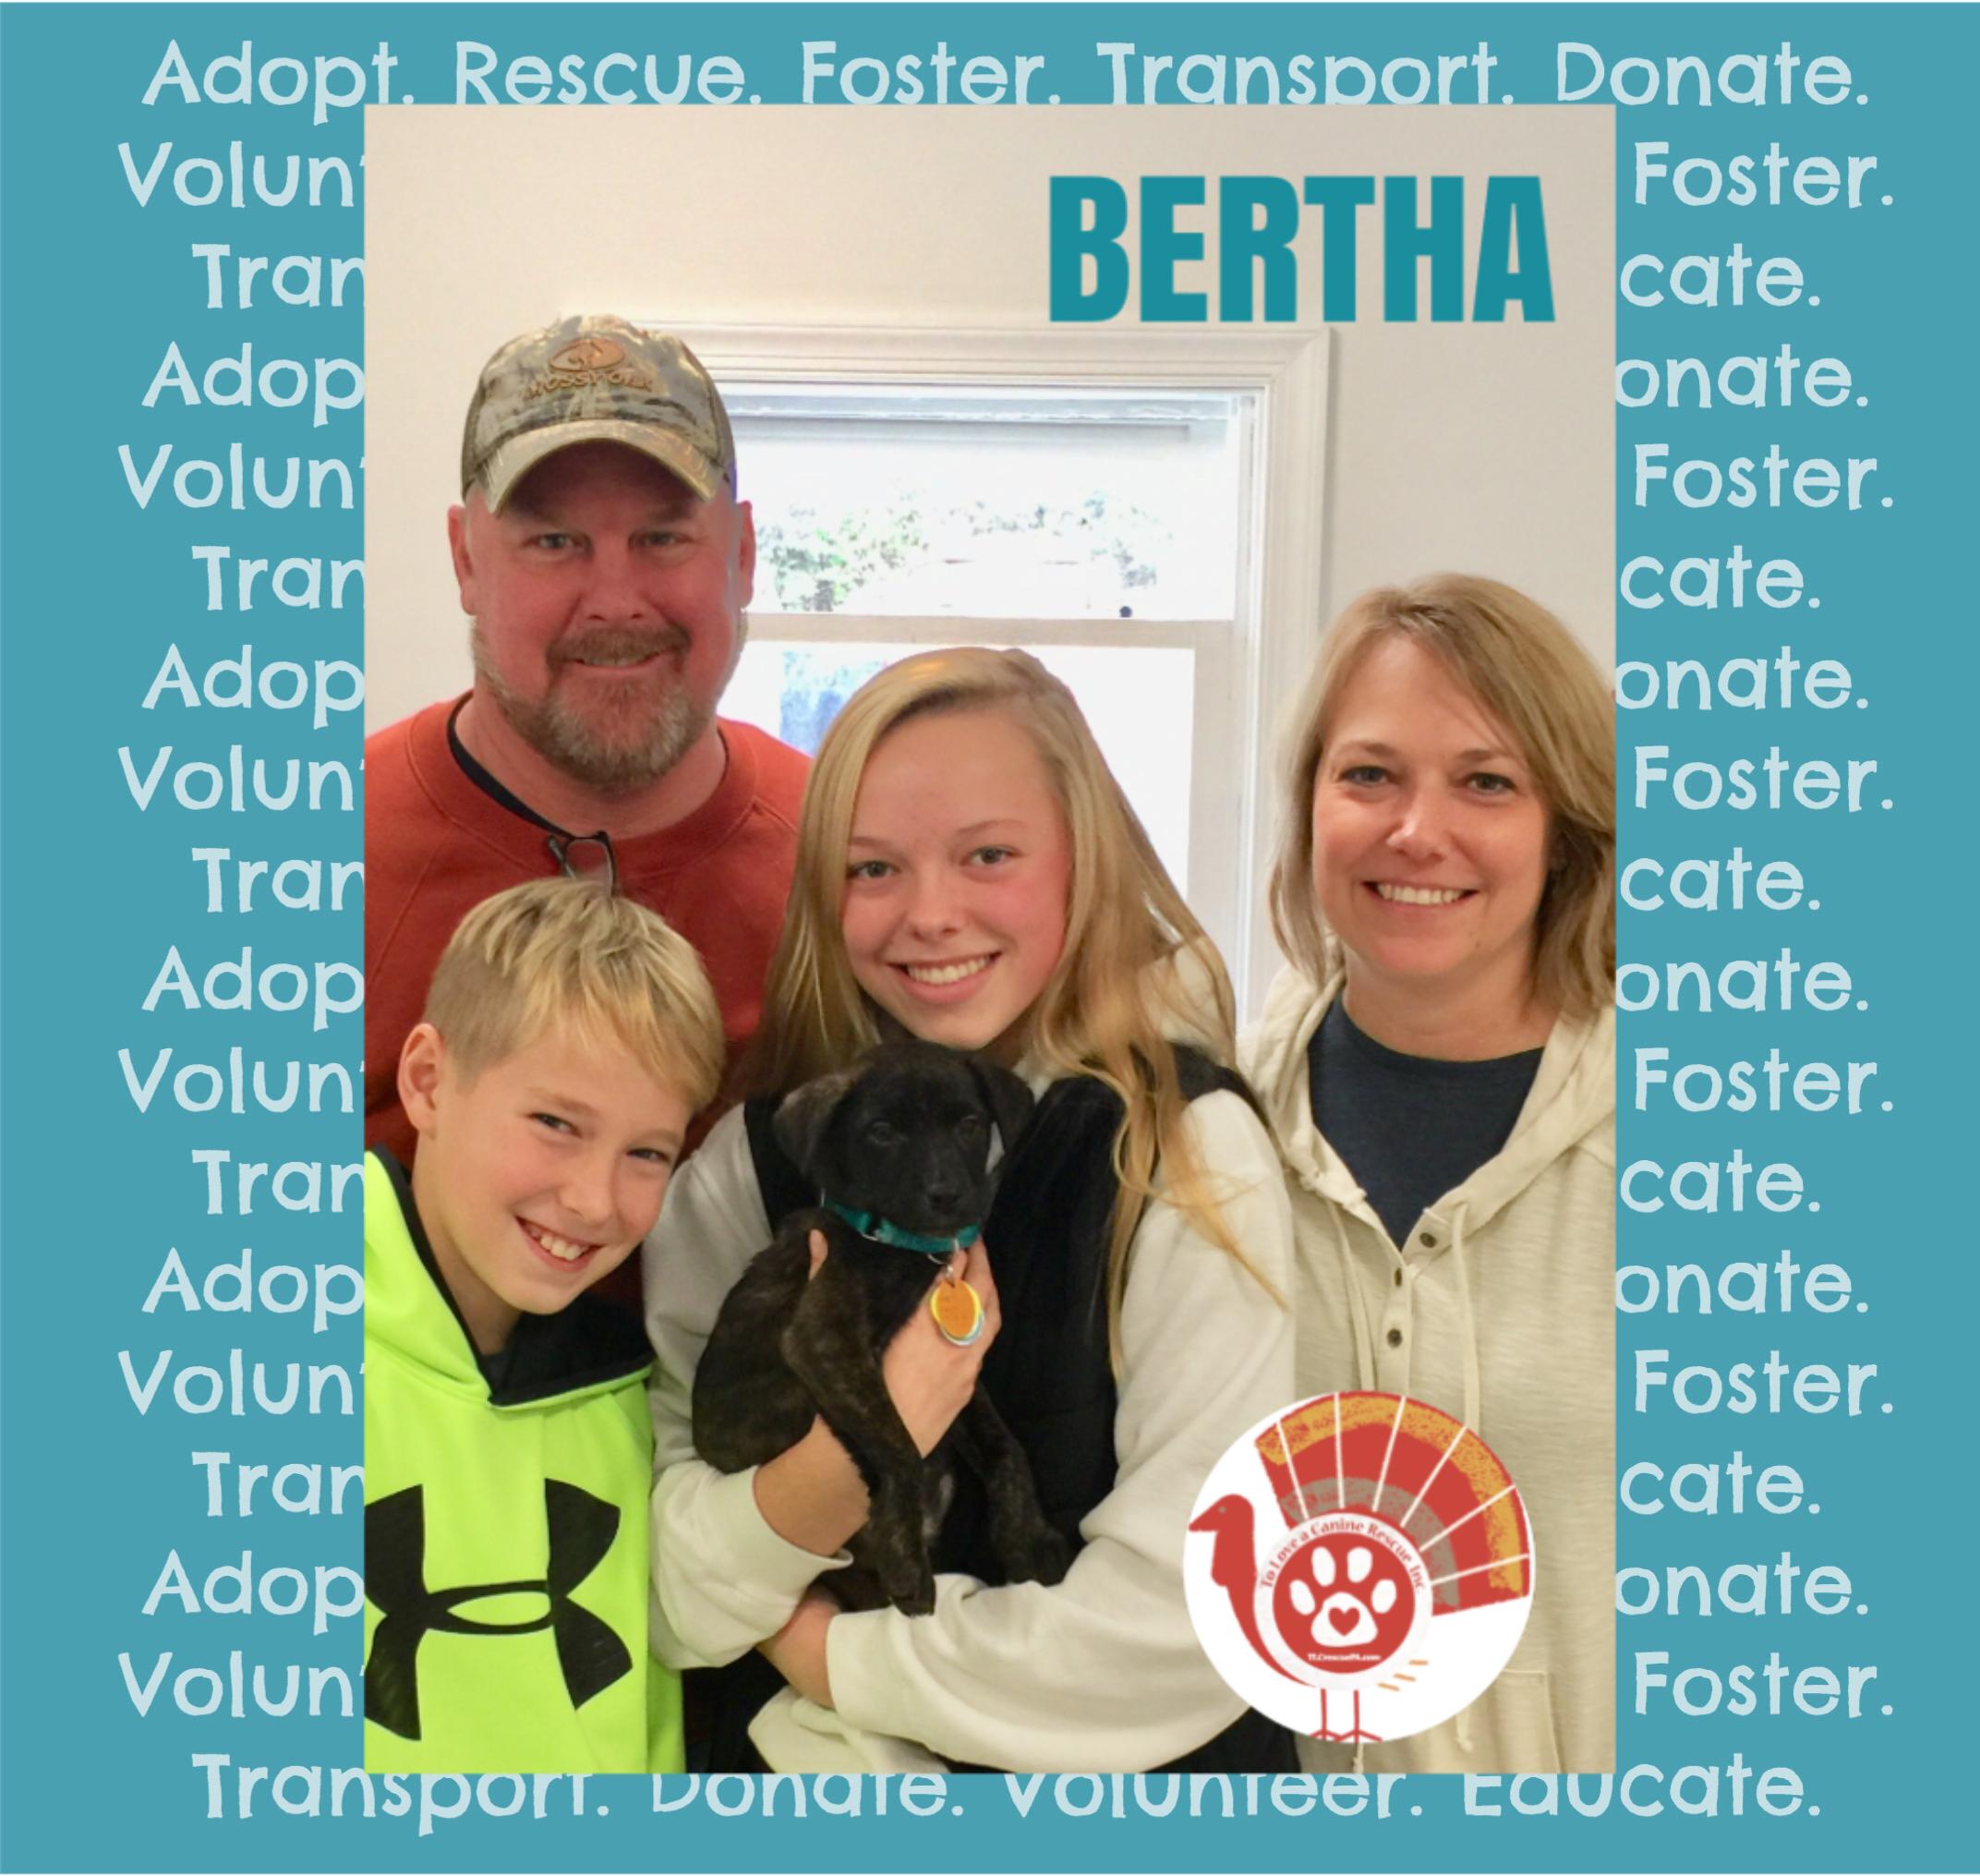 BERTHA.PNG